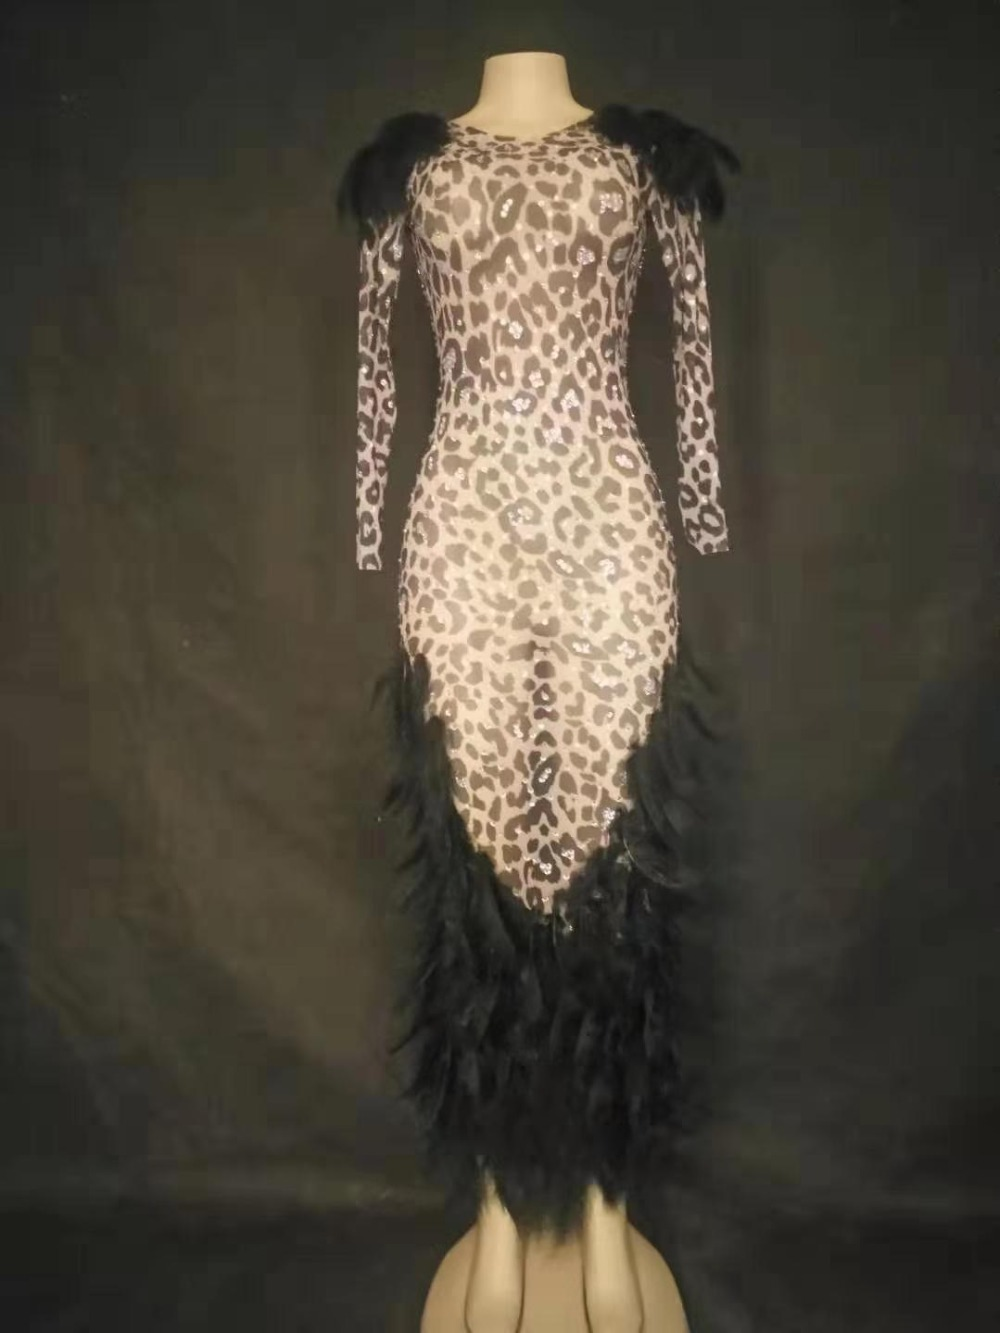 Black Feather Rhinestones Mesh Long Dress Prom Party Dress Birthday Celebrate Dress Female Singer Show Dresses YOUDU